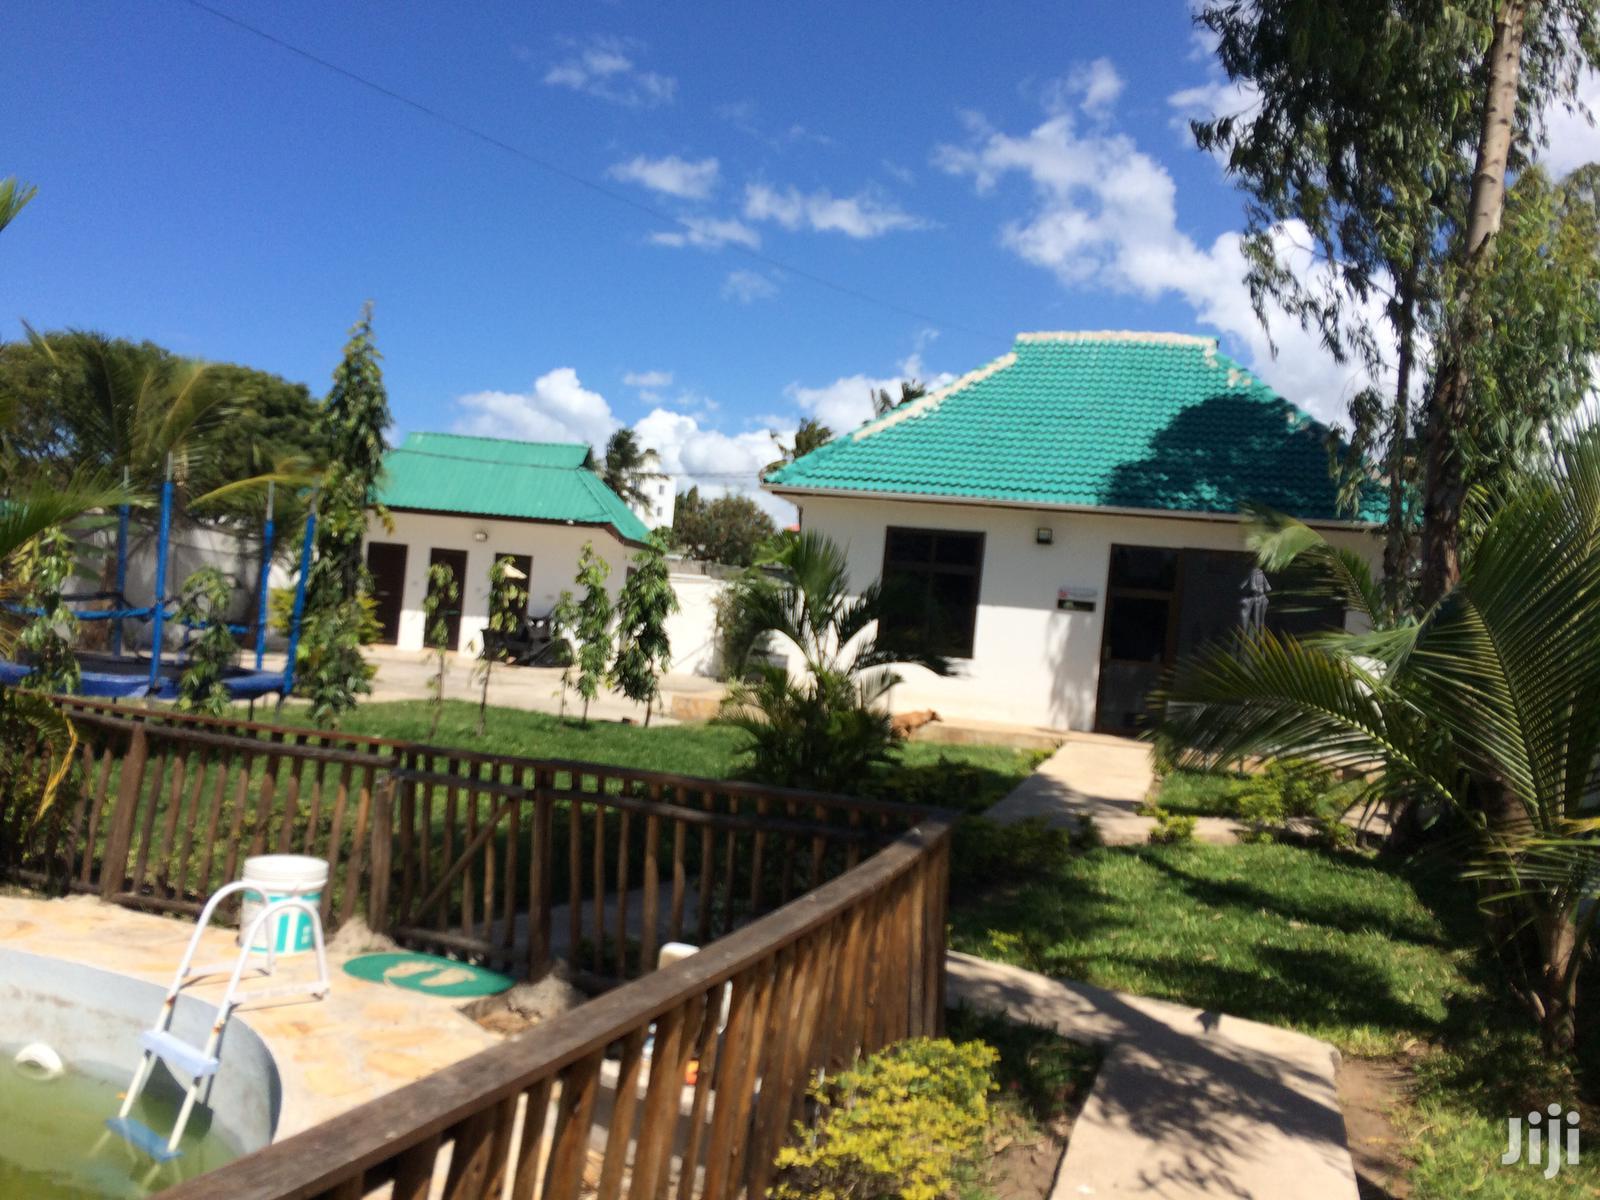 Office for Sale/Rent at Msasani Near Masaki. | Houses & Apartments For Sale for sale in Kinondoni, Dar es Salaam, Tanzania